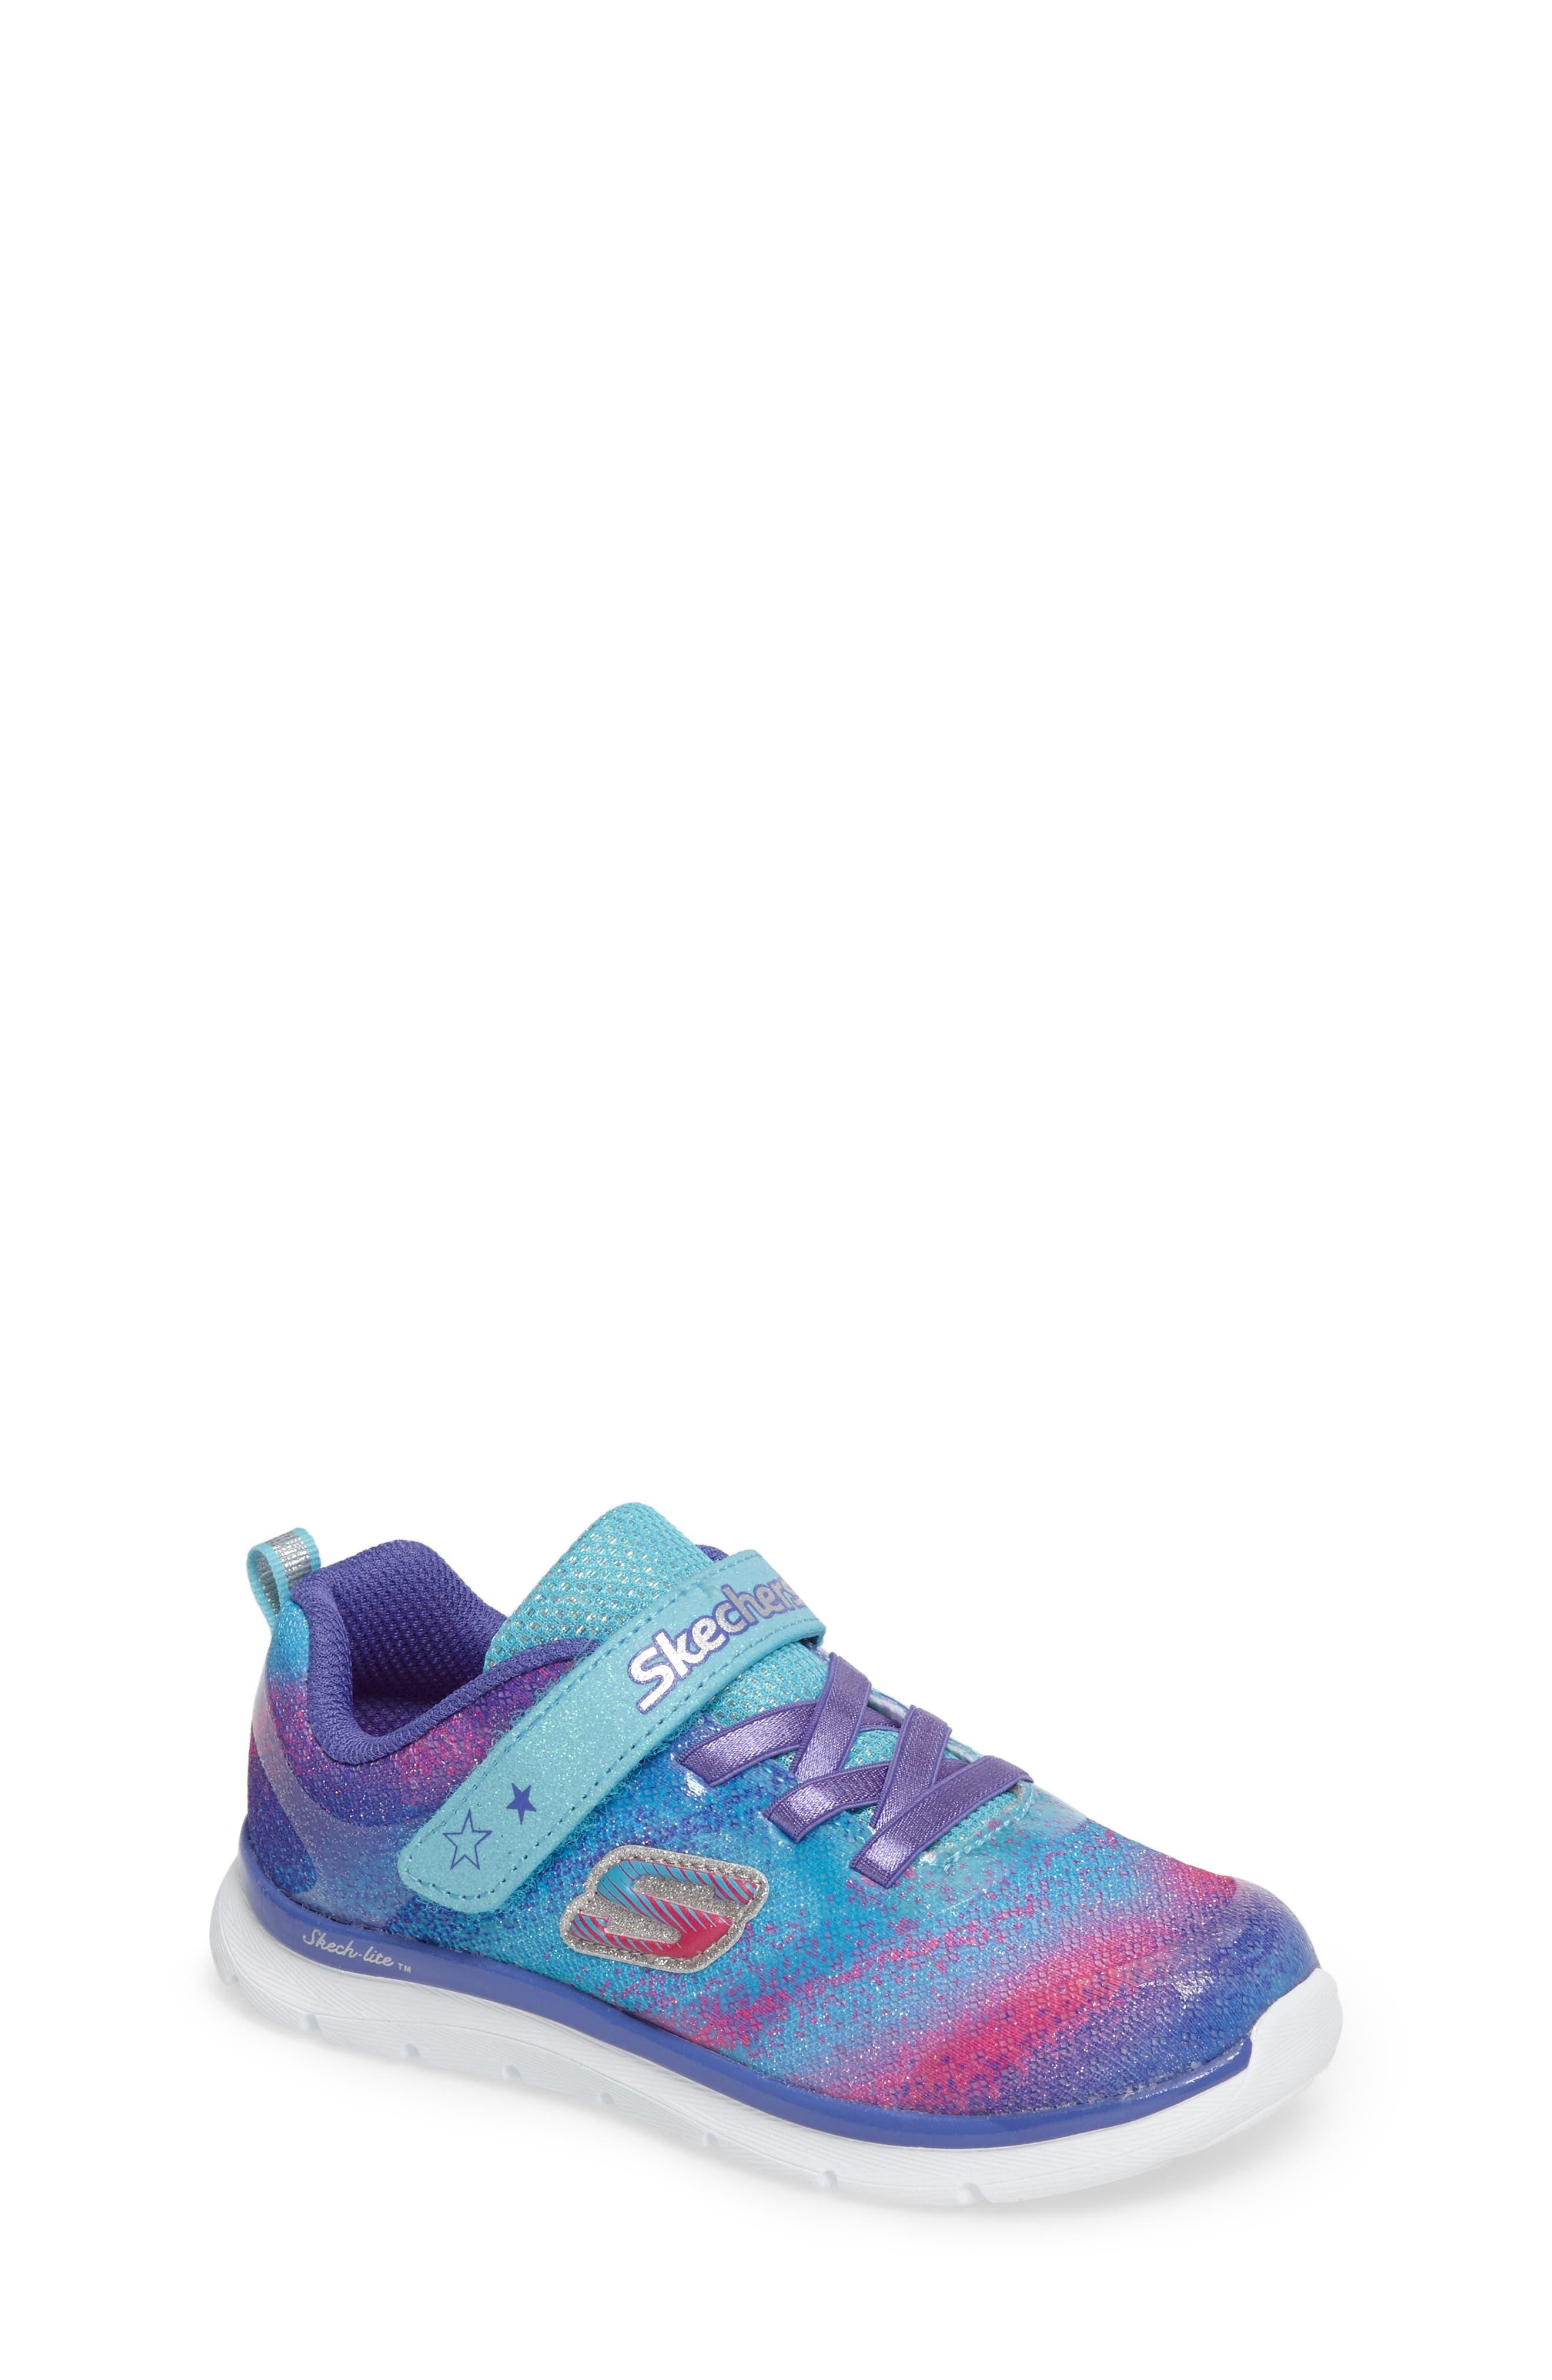 Skech-Lite Colorful Cutie Sneaker,                         Main,                         color,